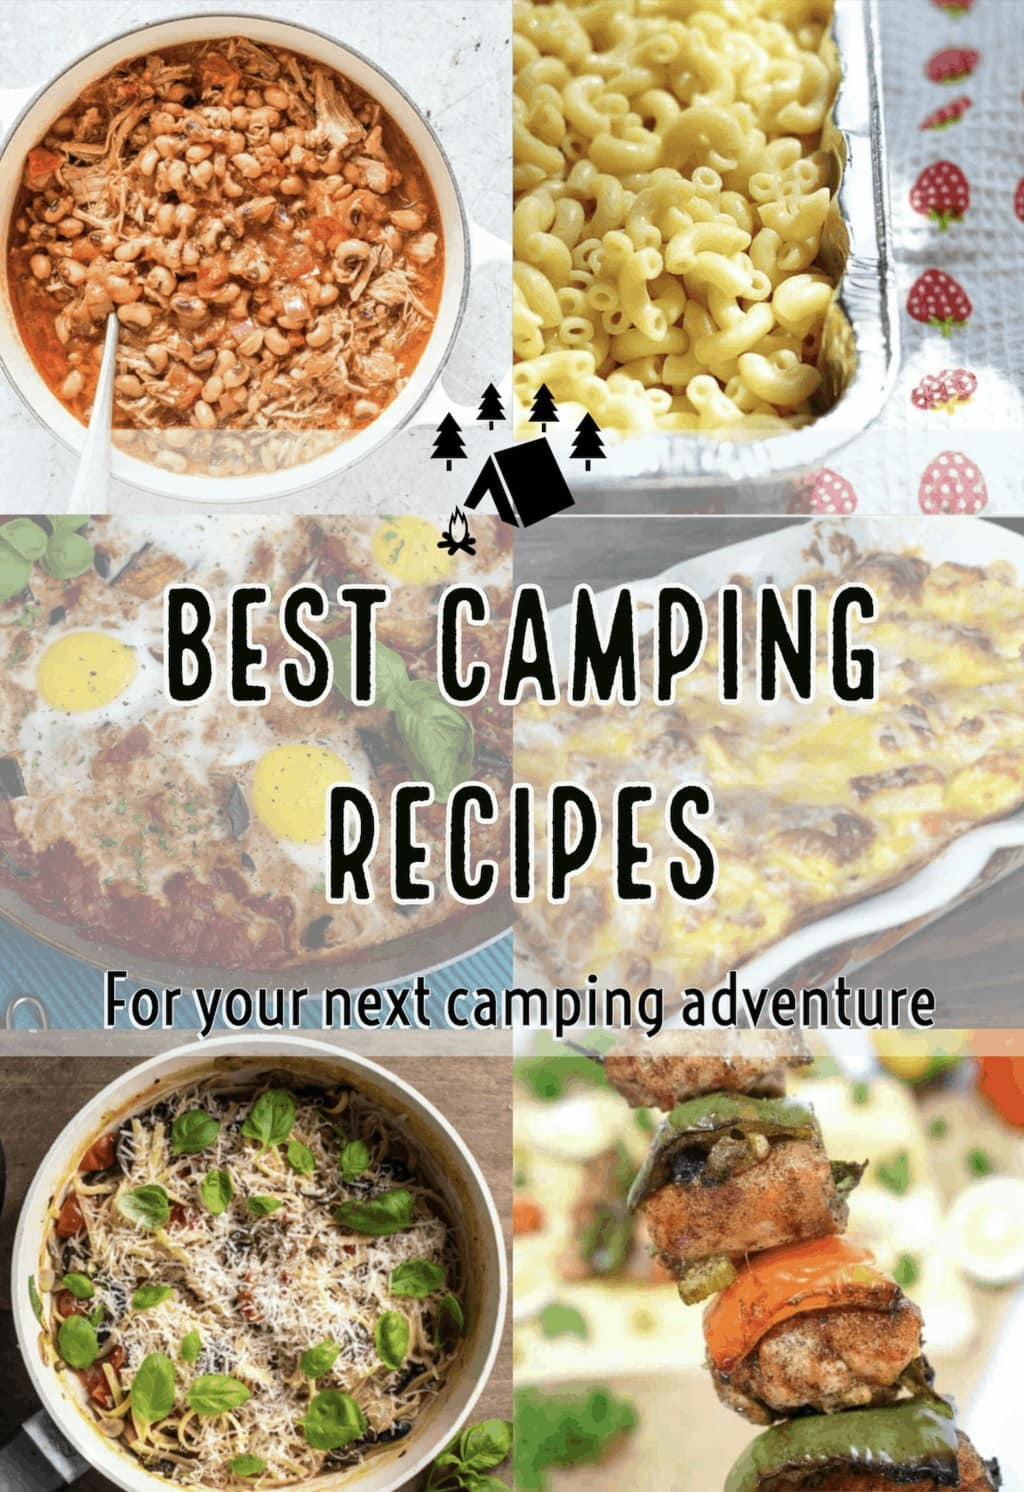 Camping Recipes, Campfire food, Camping food ideas